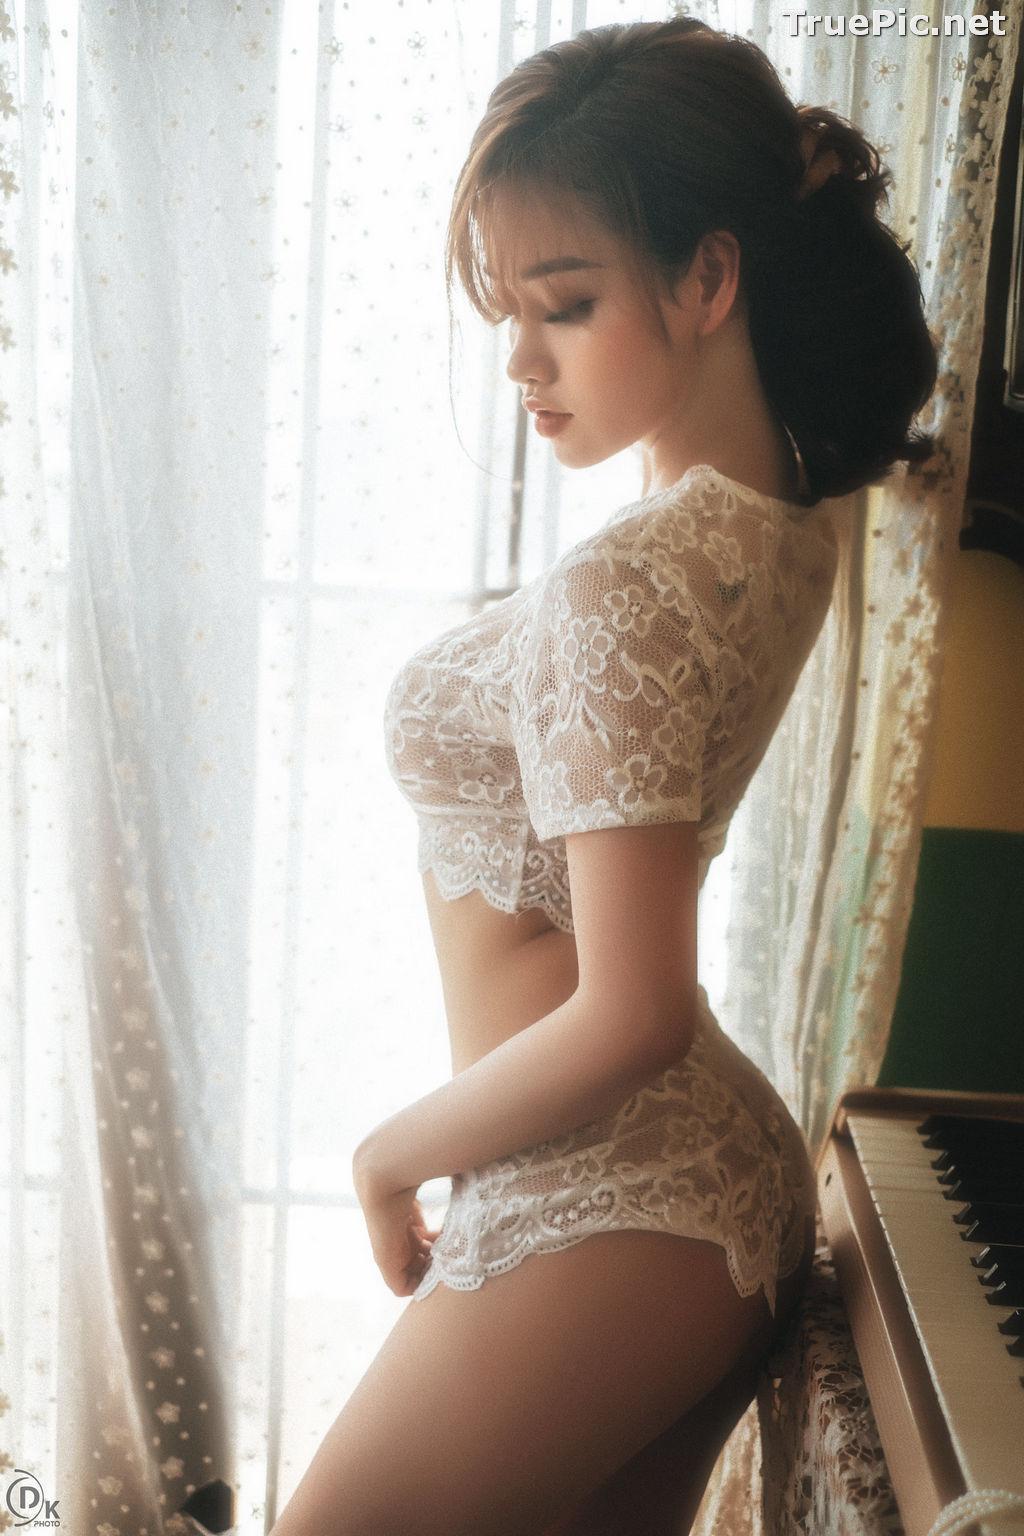 Image Vietnamese Hot Model - Sleepwear and Lingerie Under Dawnlight - TruePic.net - Picture-4